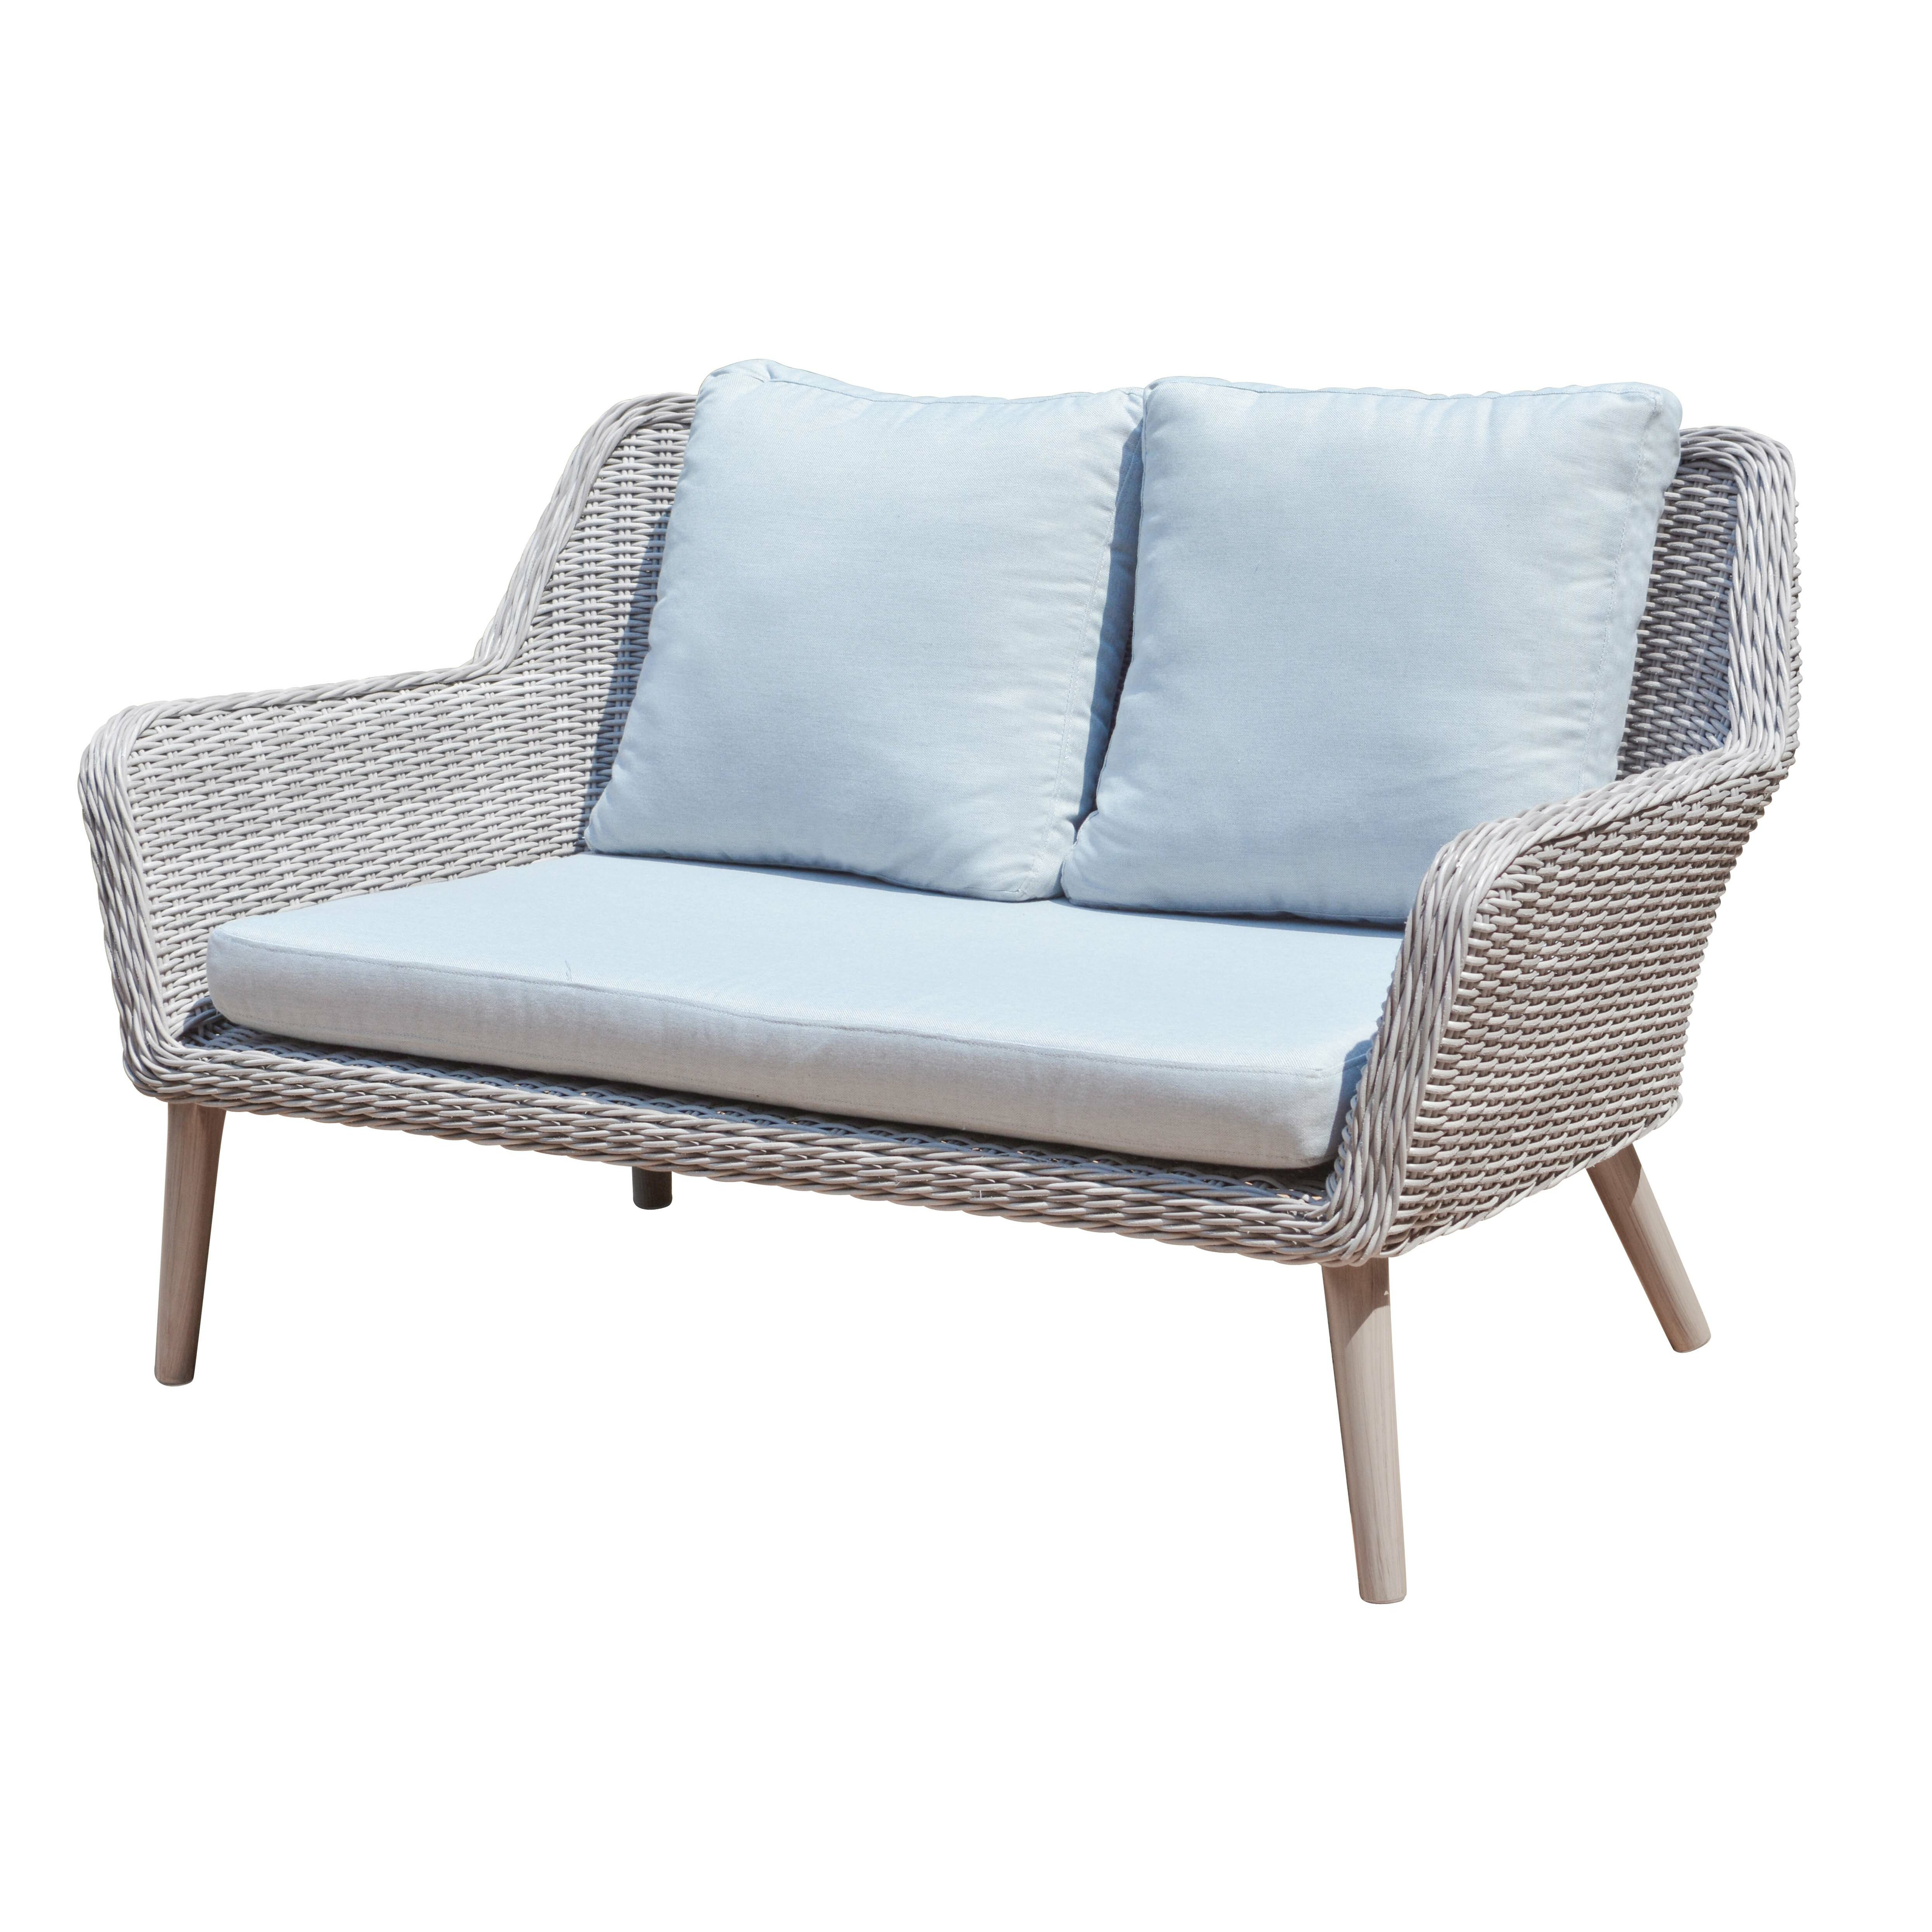 manopatio weimar outdoor wicker rattan 4 piece lounge seating group wayfair. Black Bedroom Furniture Sets. Home Design Ideas